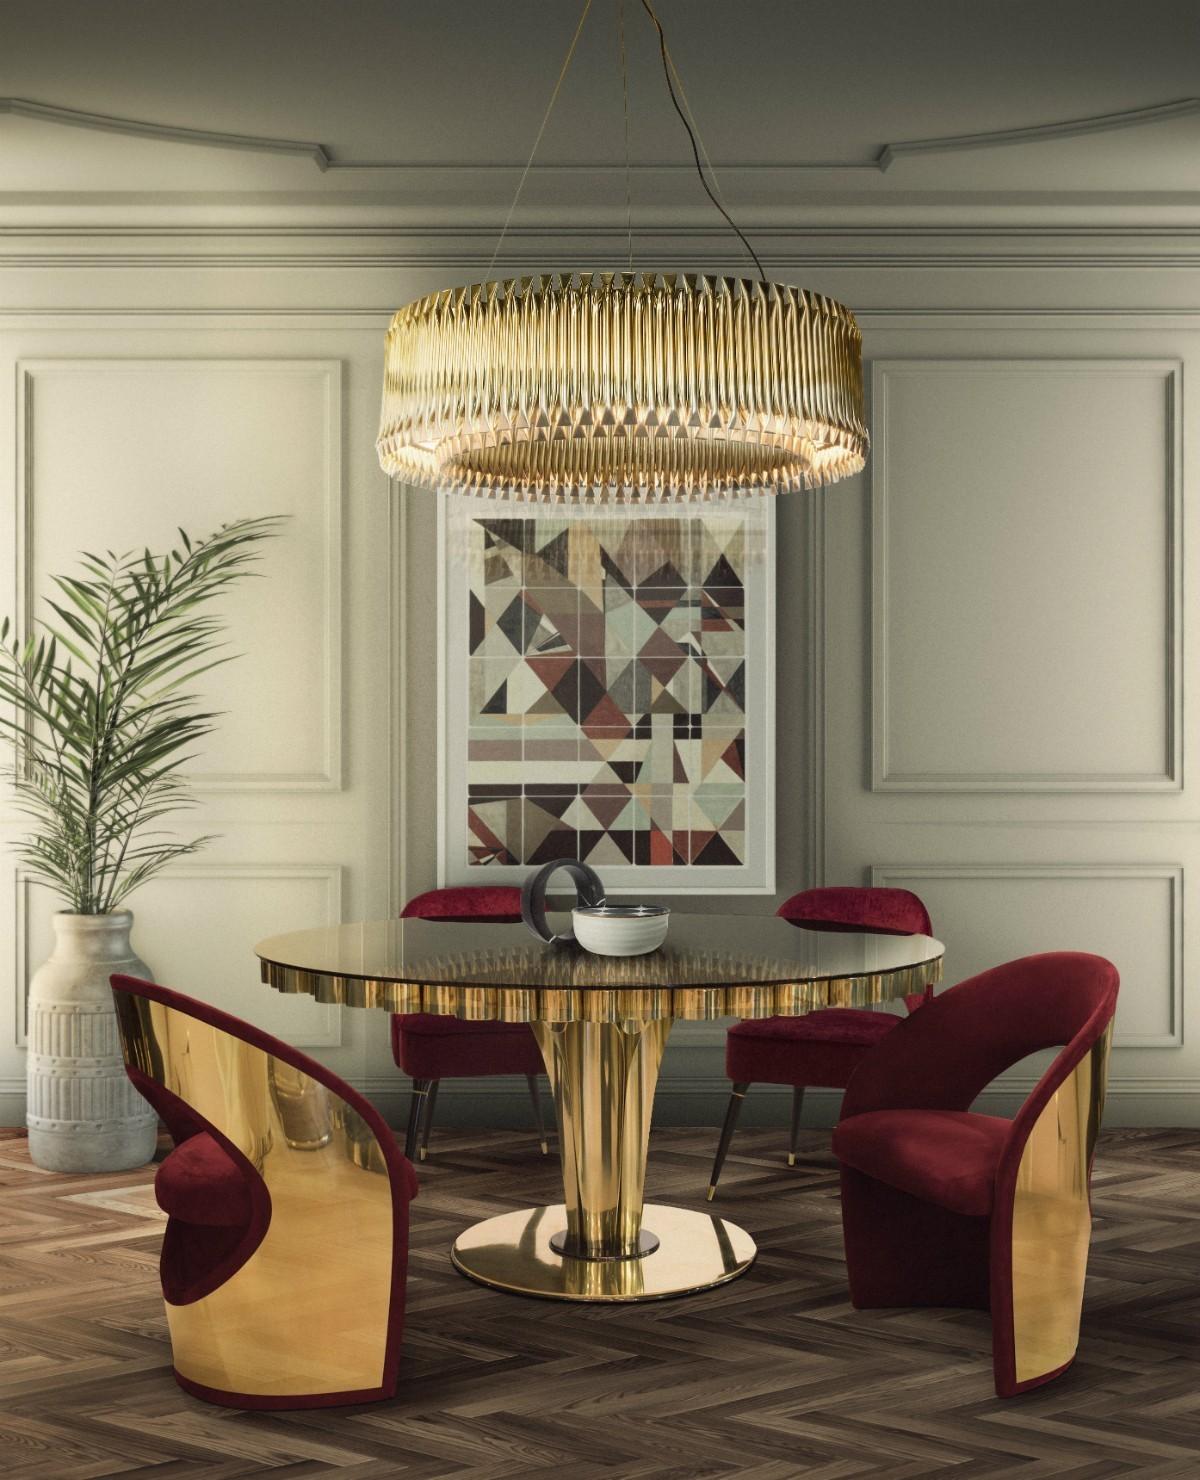 Top Minimalist Dining Chairs minimalist dining chairs Top Minimalist Dining Chairs jones